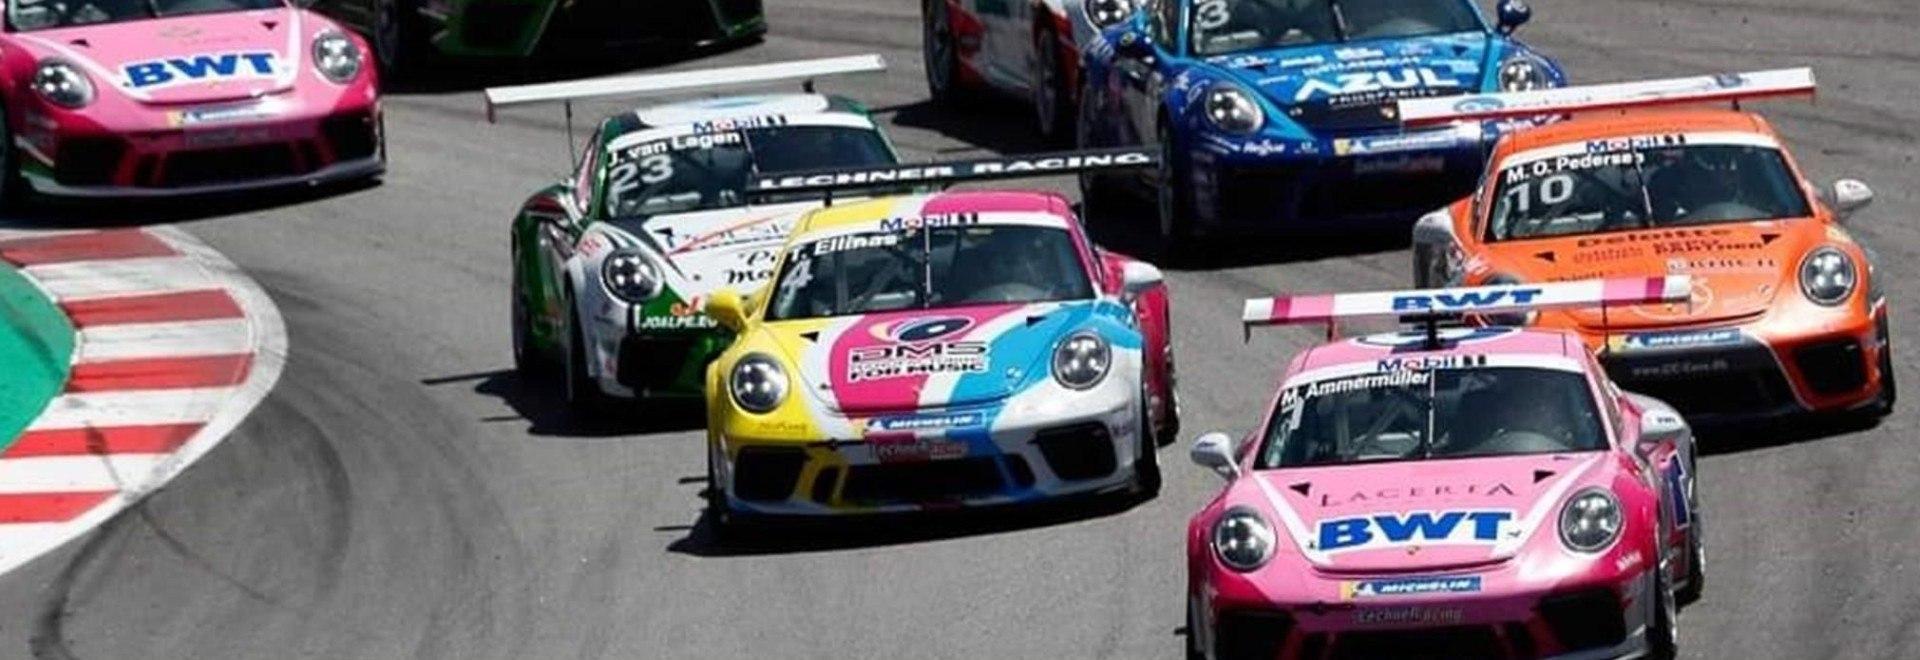 Porsche Super Cup - stagione 2021 | Sky